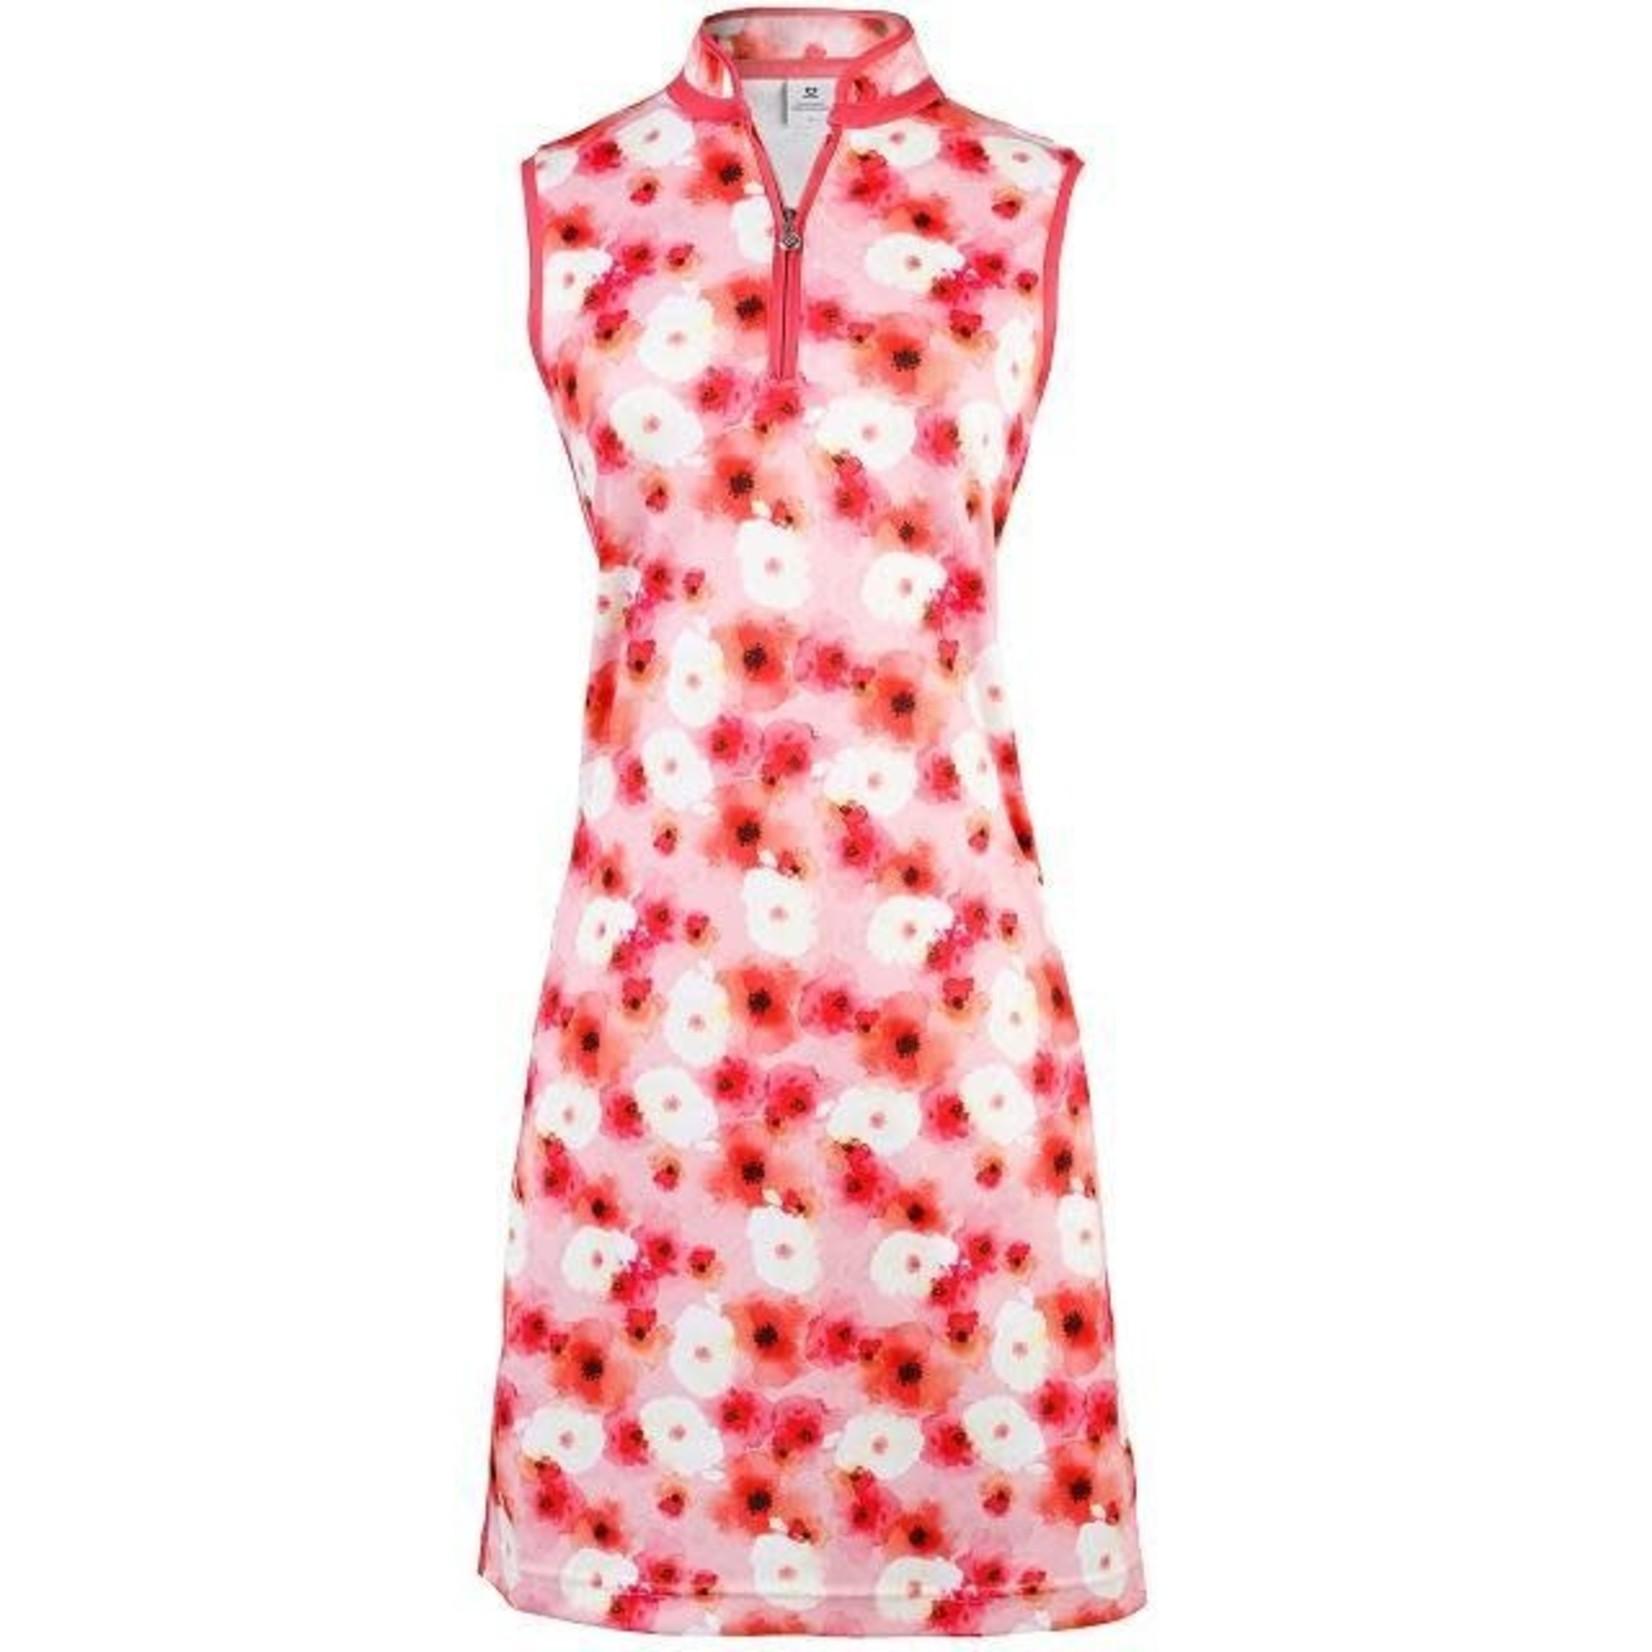 Daily Sports Daily Tori S/L Dress Watermelon M